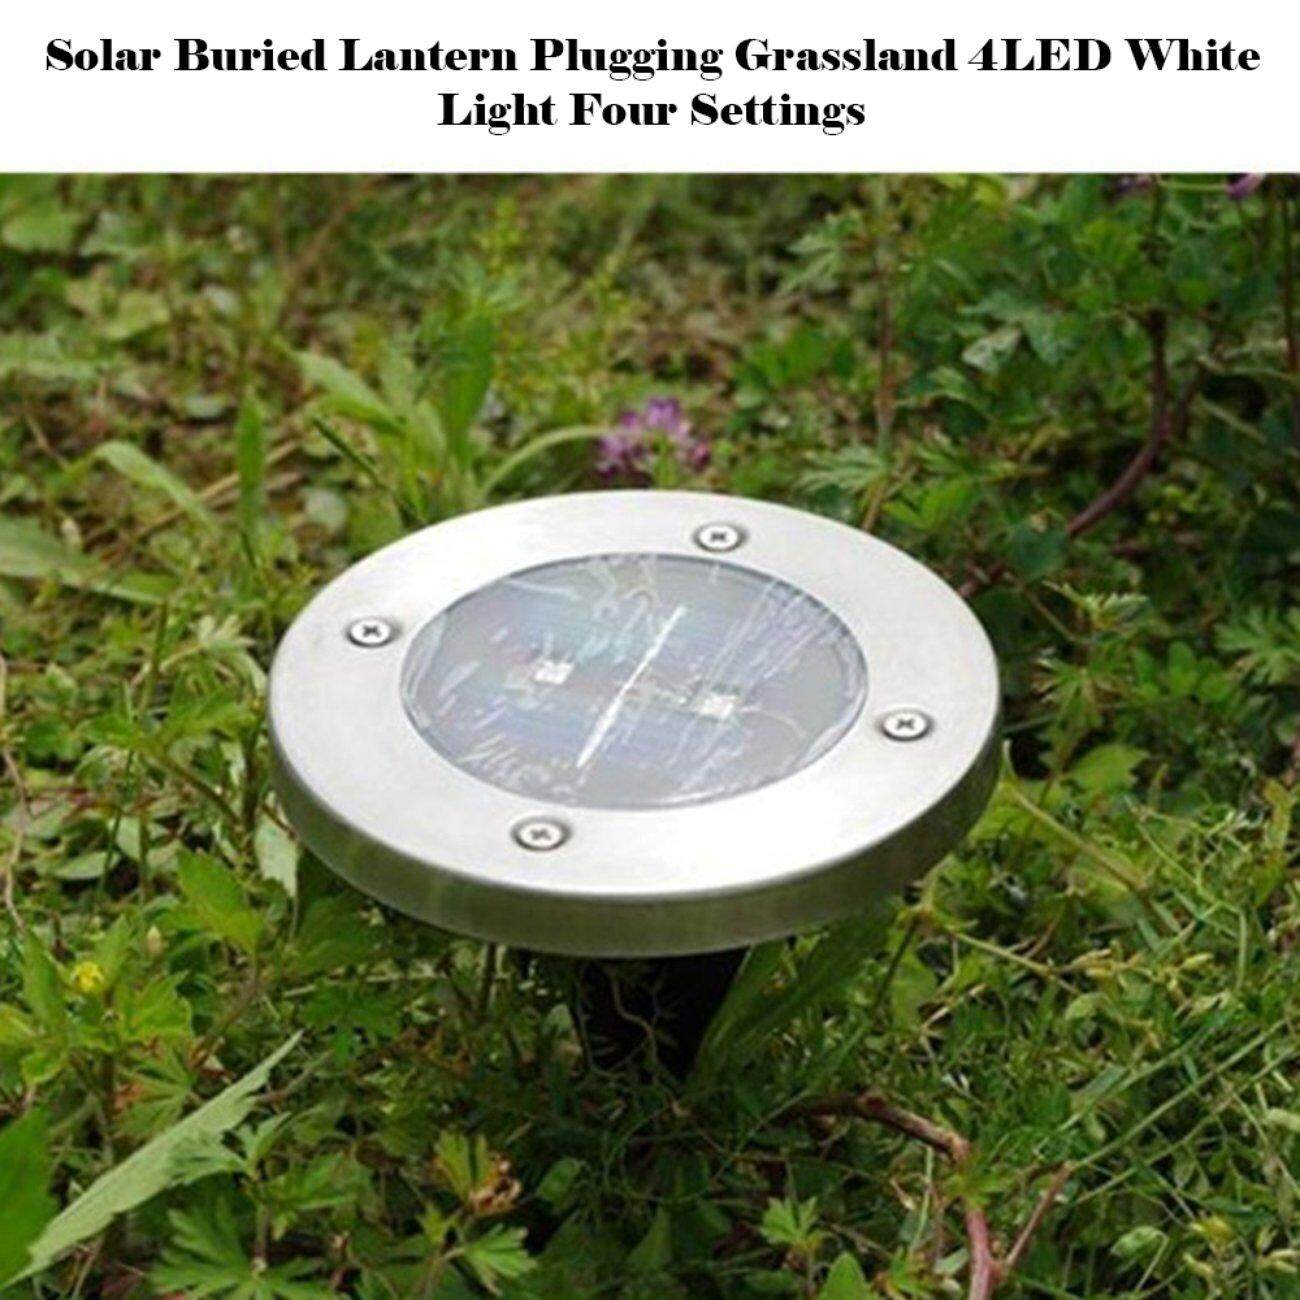 Hot Deals Solar Underground Light 8Led Stainless Steel Outdoors Ground Grass Light